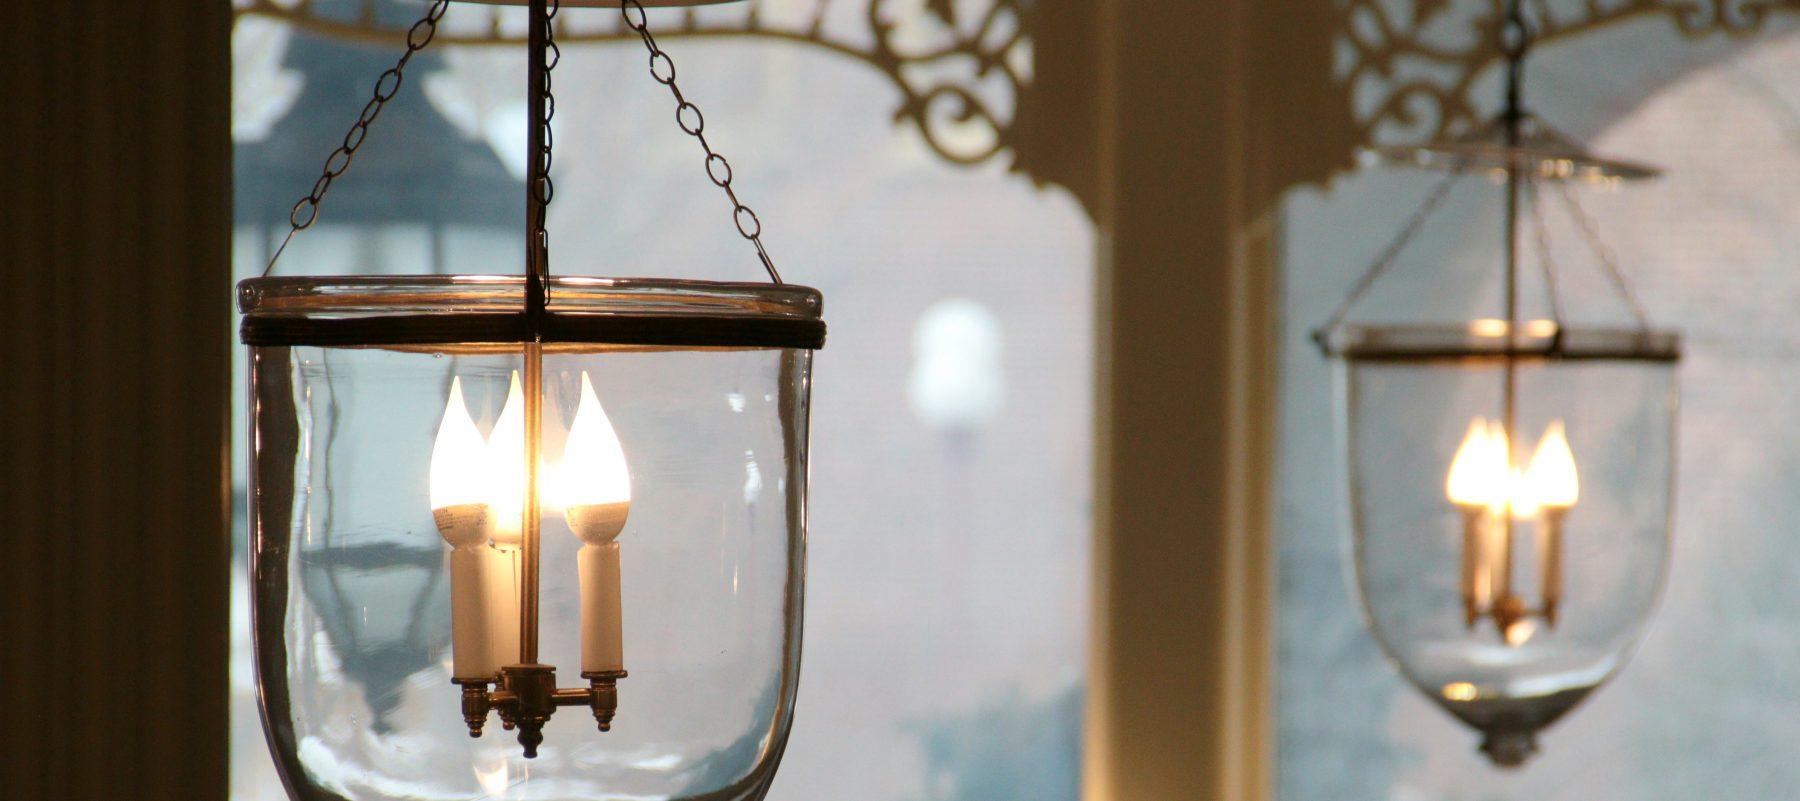 Lantern at St. James Hotel